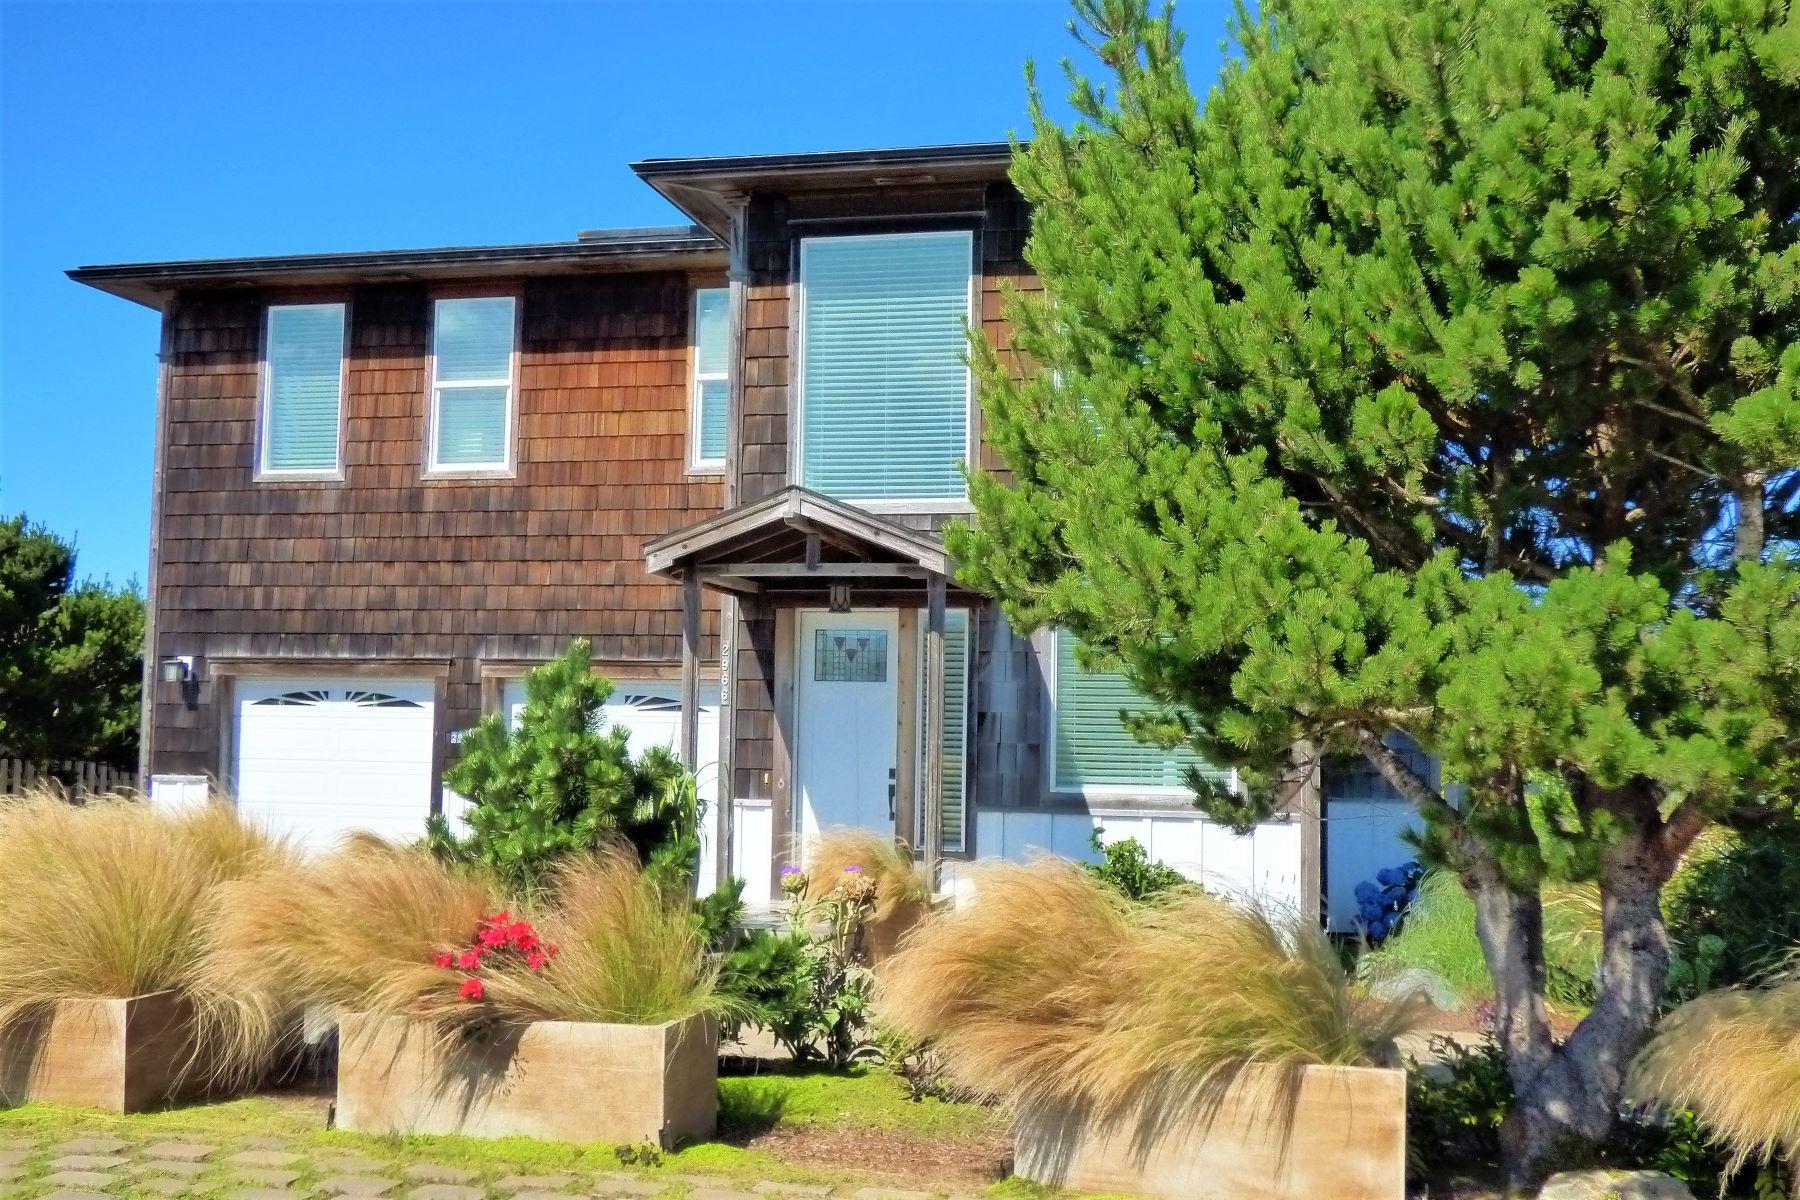 Single Family Homes για την Πώληση στο 2966 Ruby Court, Bandon, OR 97411 Bandon, Ορεγκον 97411 Ηνωμένες Πολιτείες